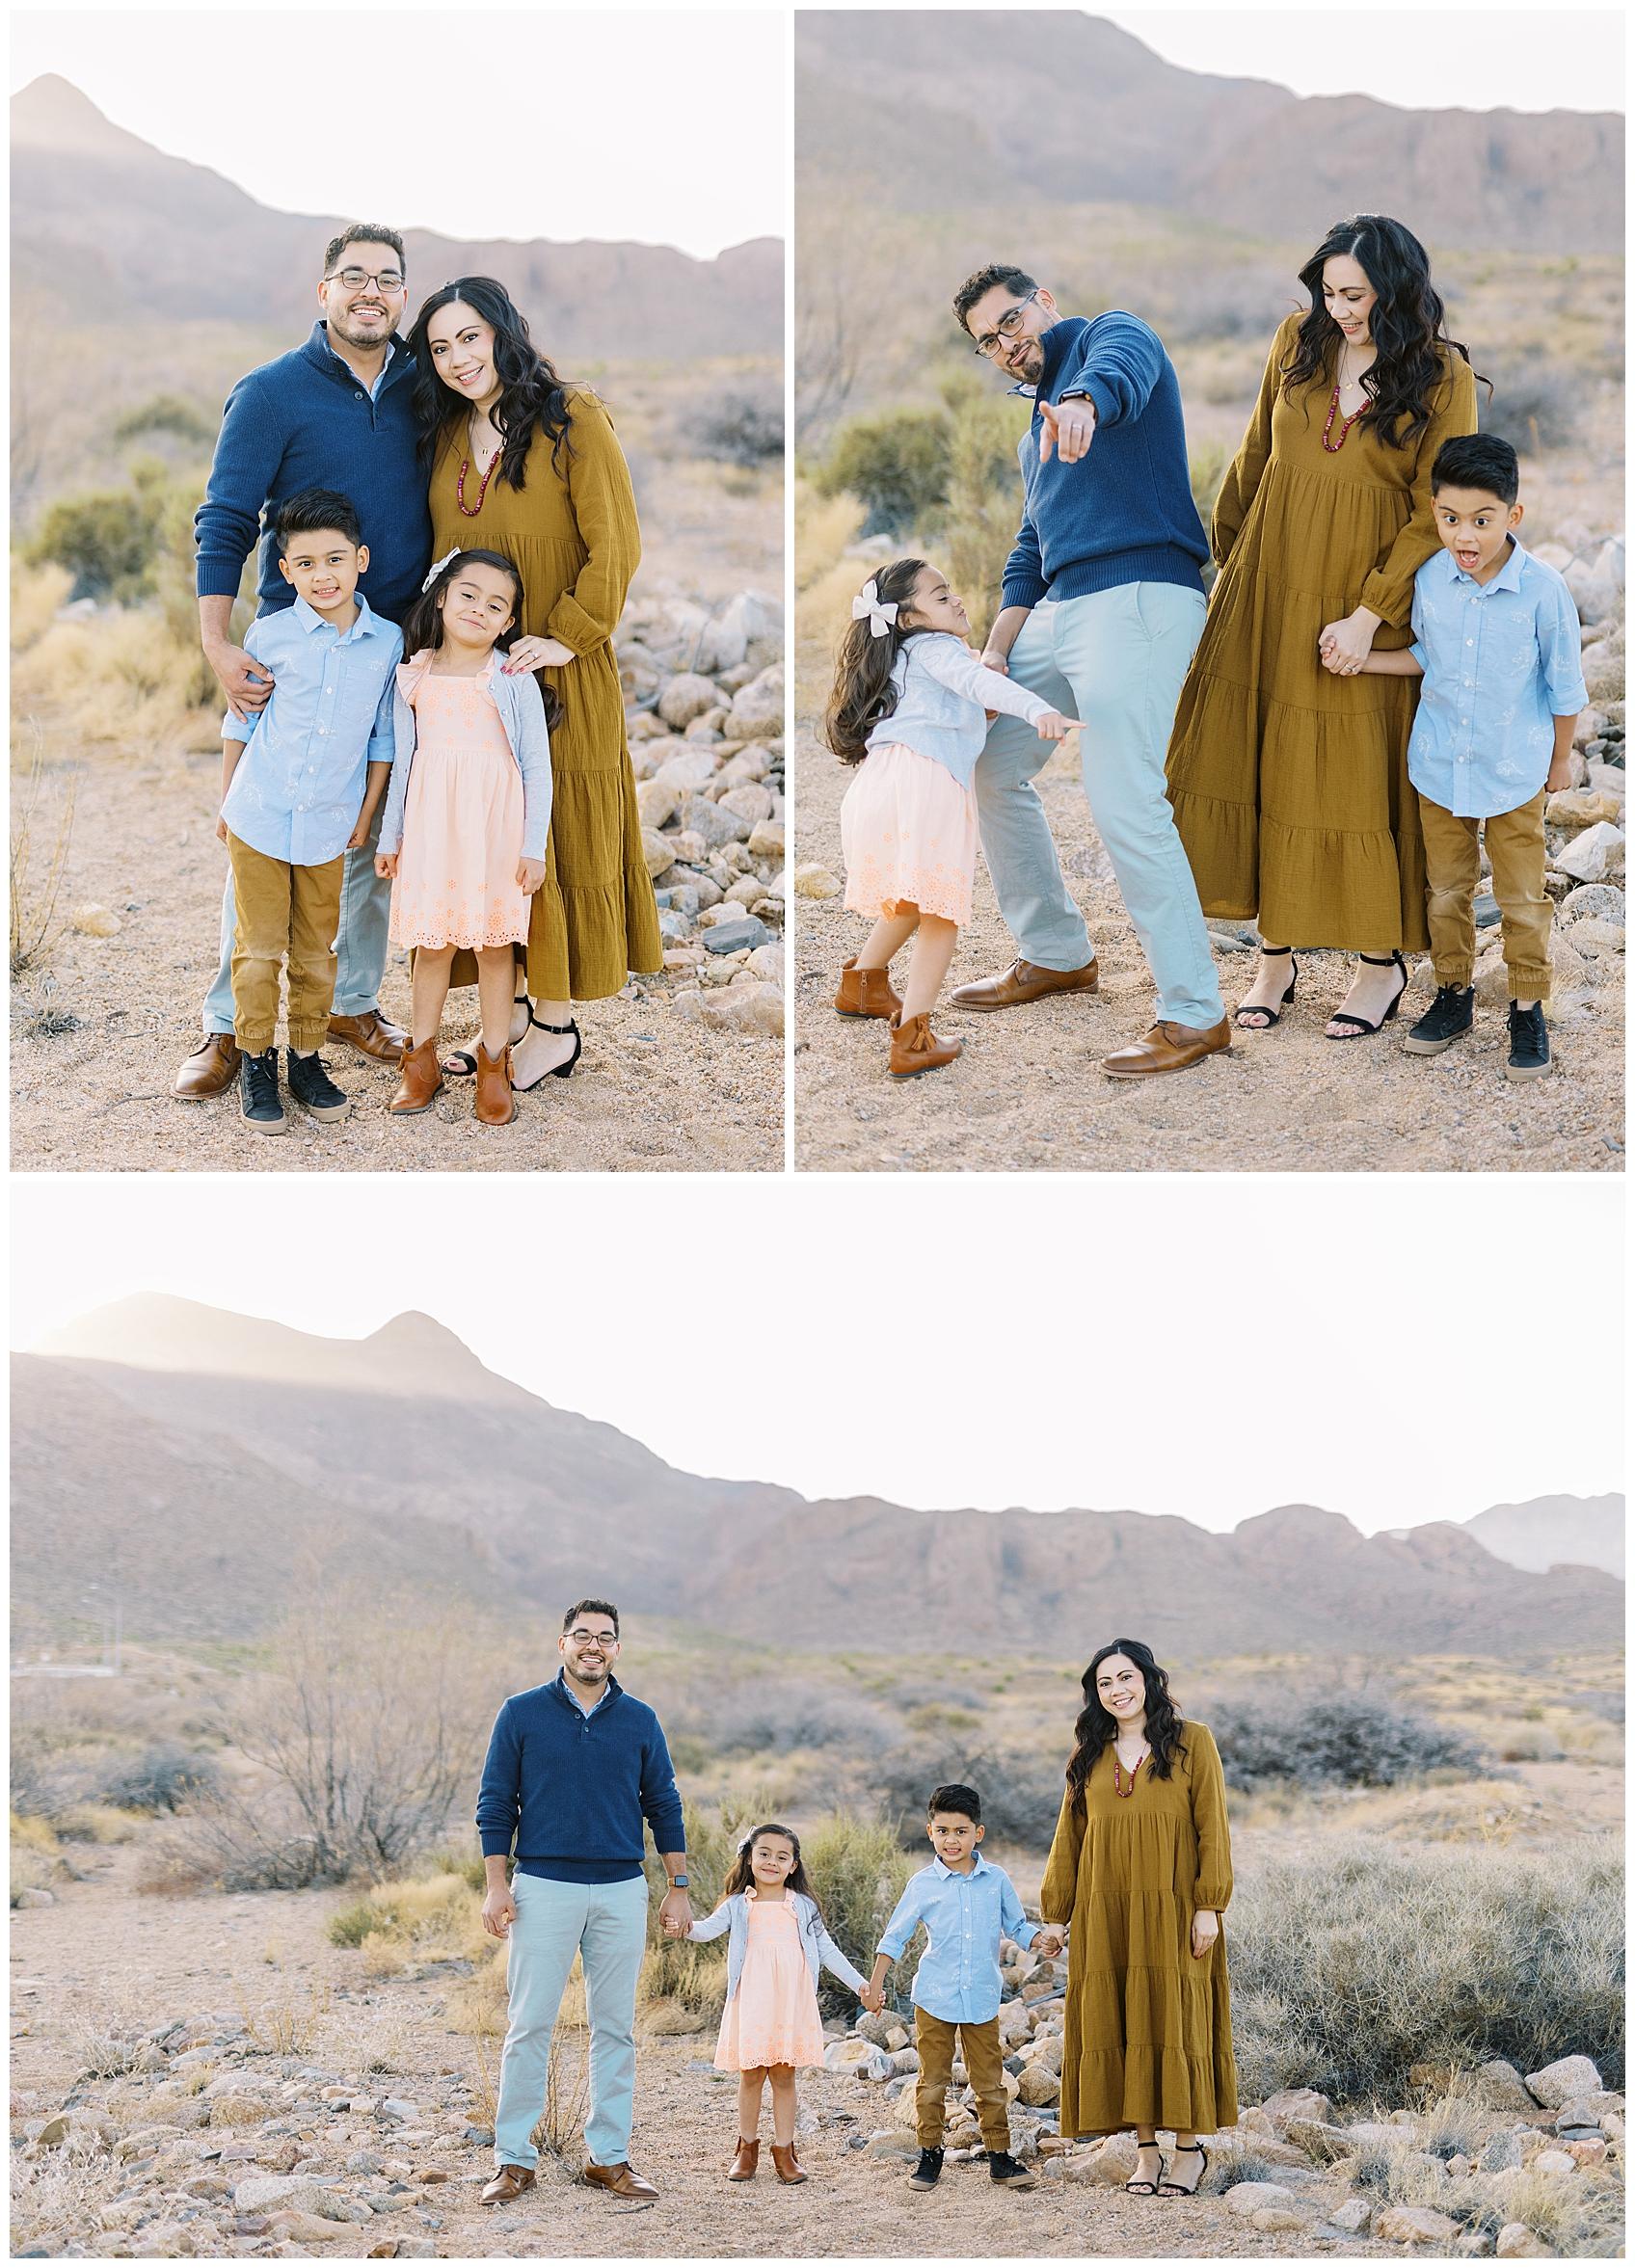 El Paso Desert Extended Family Session, el paso photography, el paso mountains, el paso desert session,